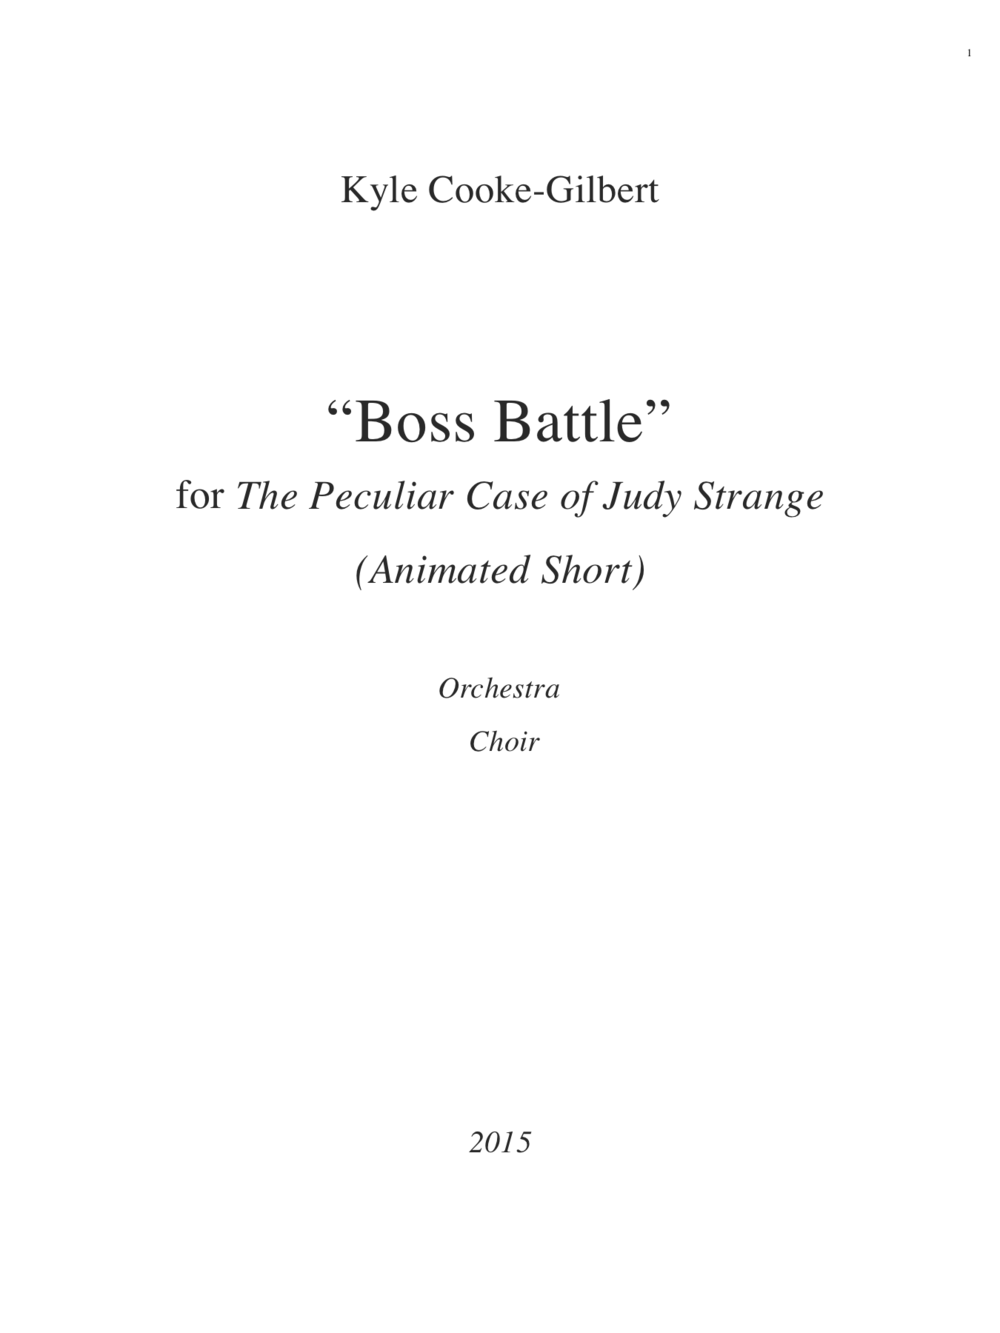 Peculiar Case of Judy Strange.png